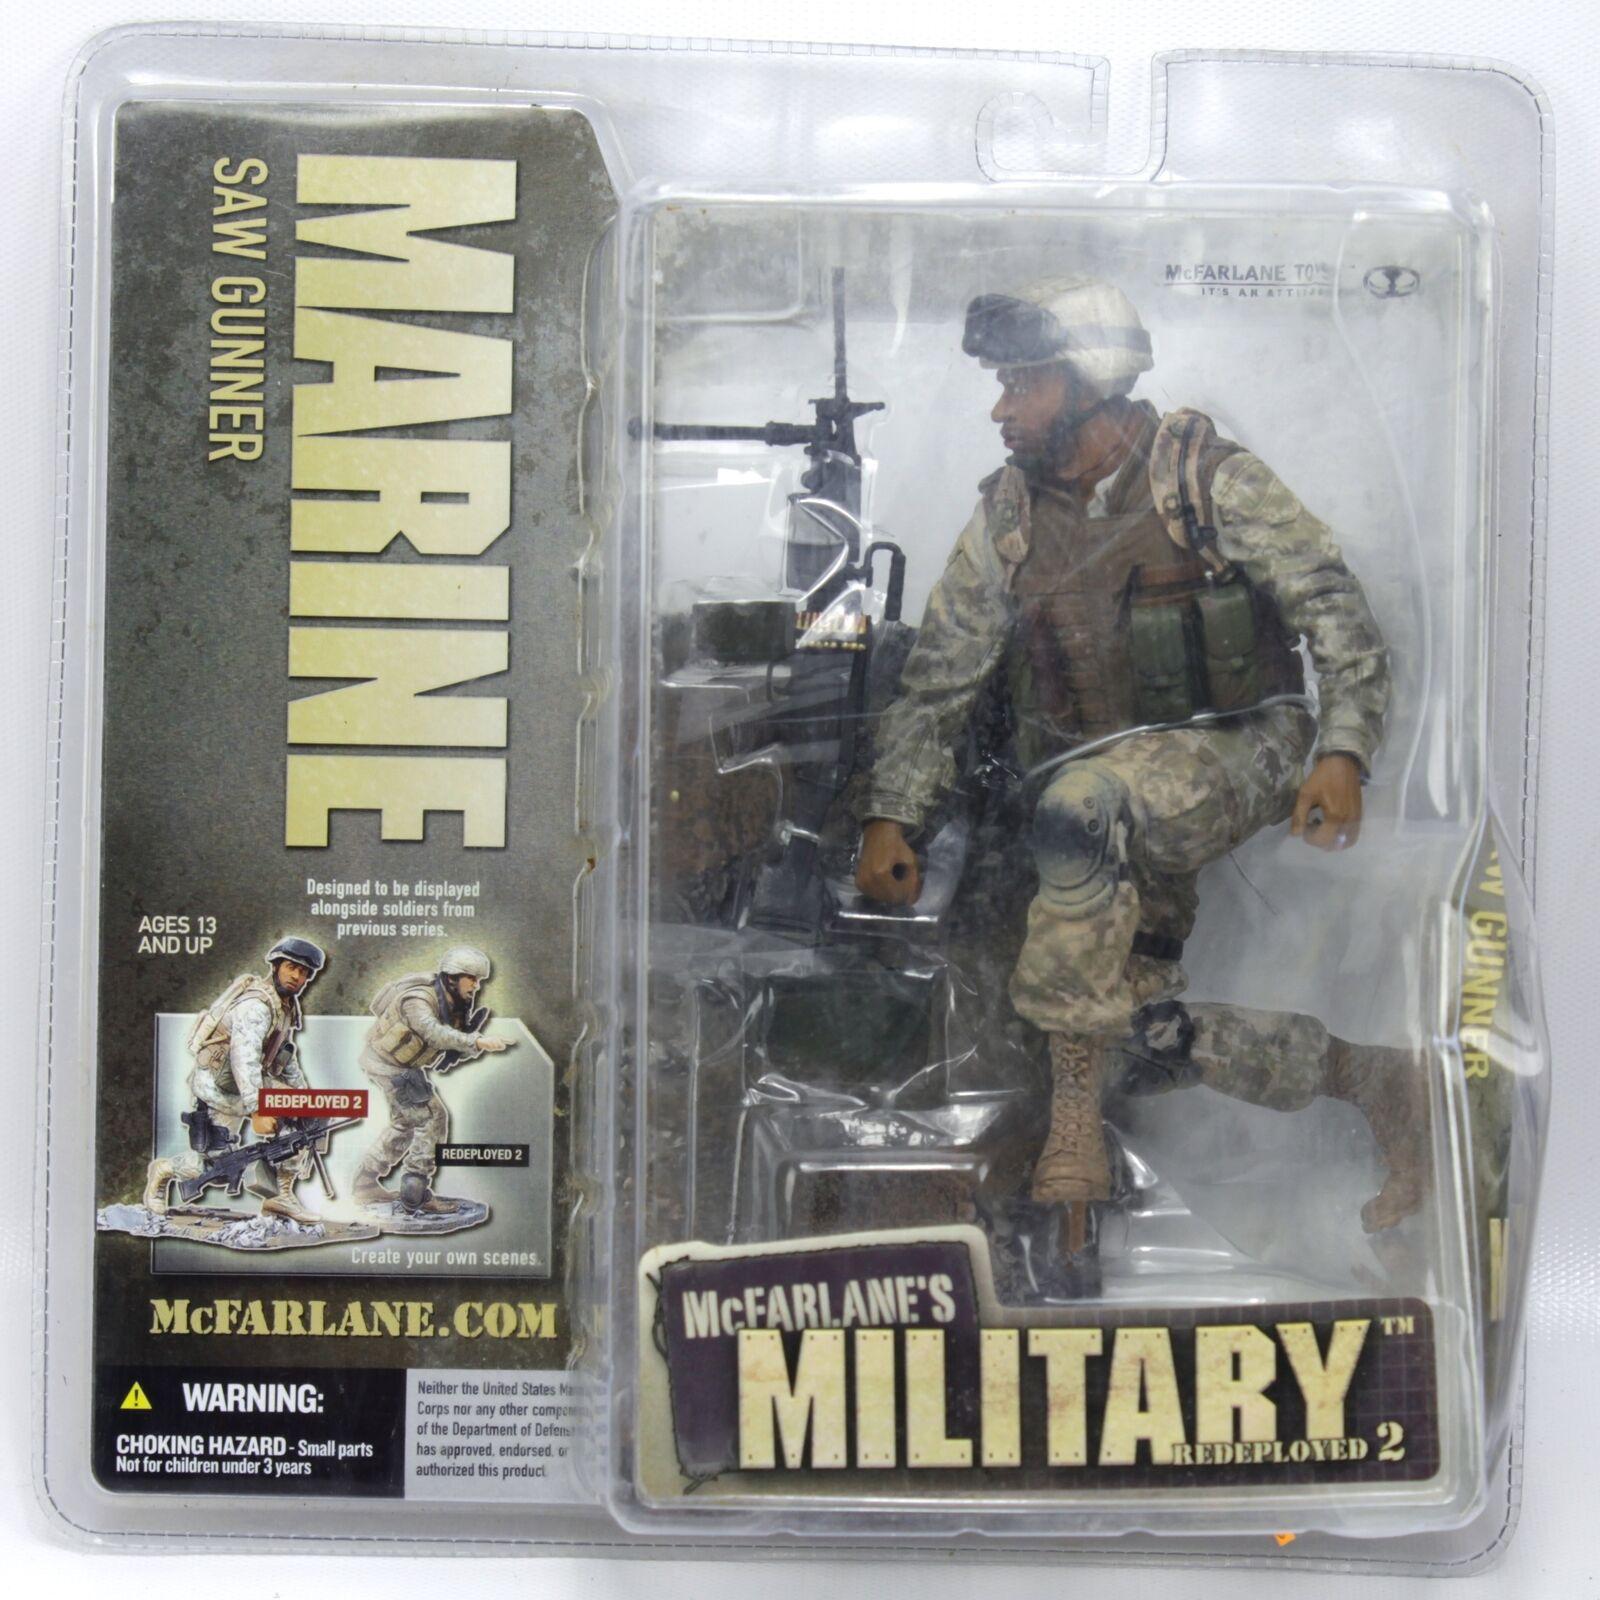 McFarlane Military Marine Saw Gunner Redeployed 2 African American Action Figure